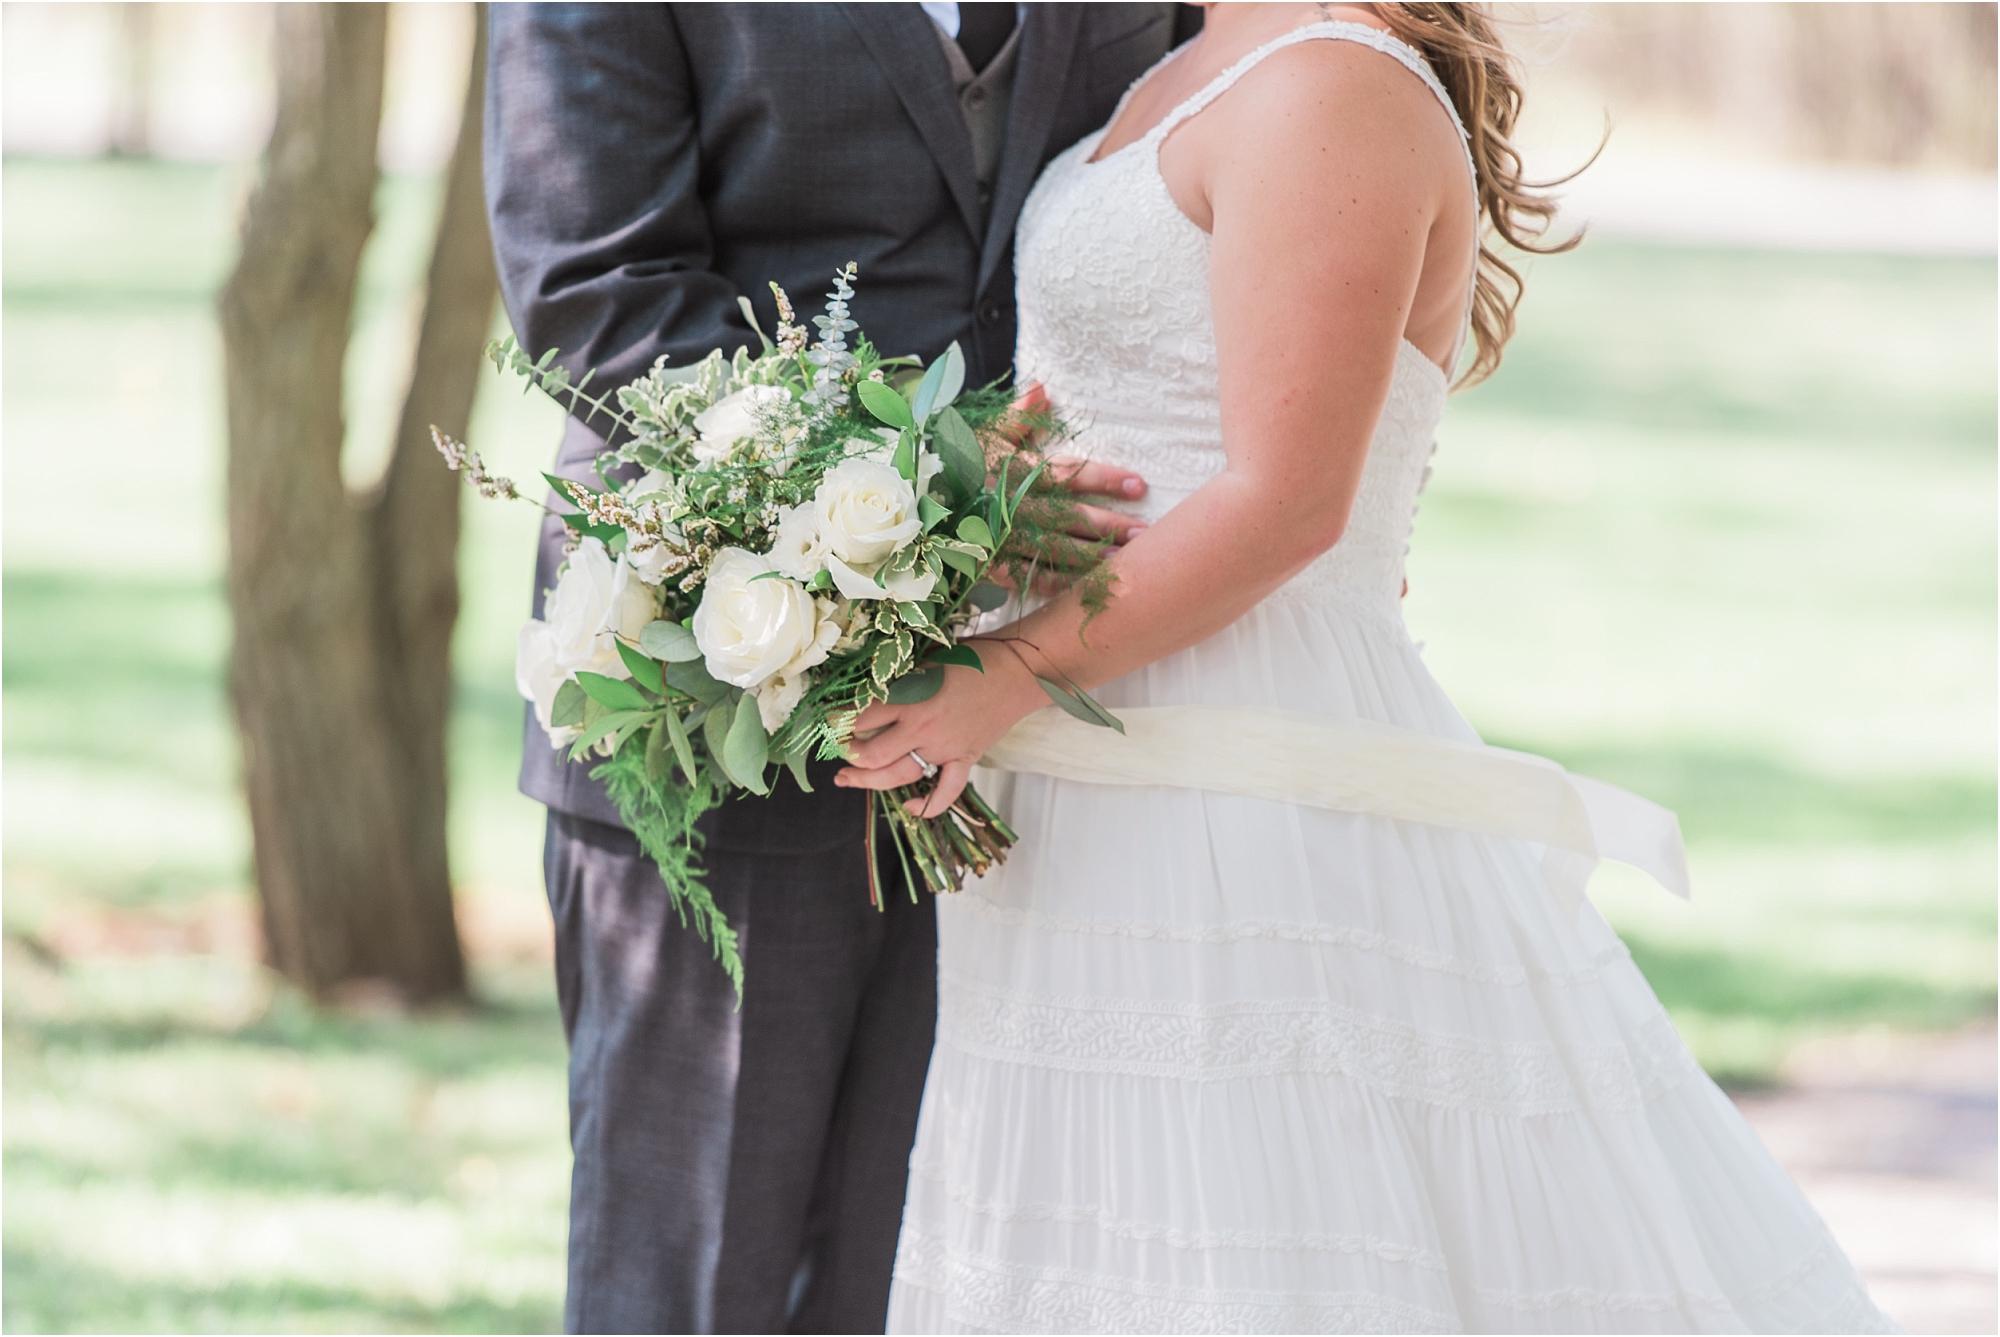 0030 Summer Stonefields Wedding Carleton Place - Ottawa Wedding - Photography by Emma_WEB.jpg